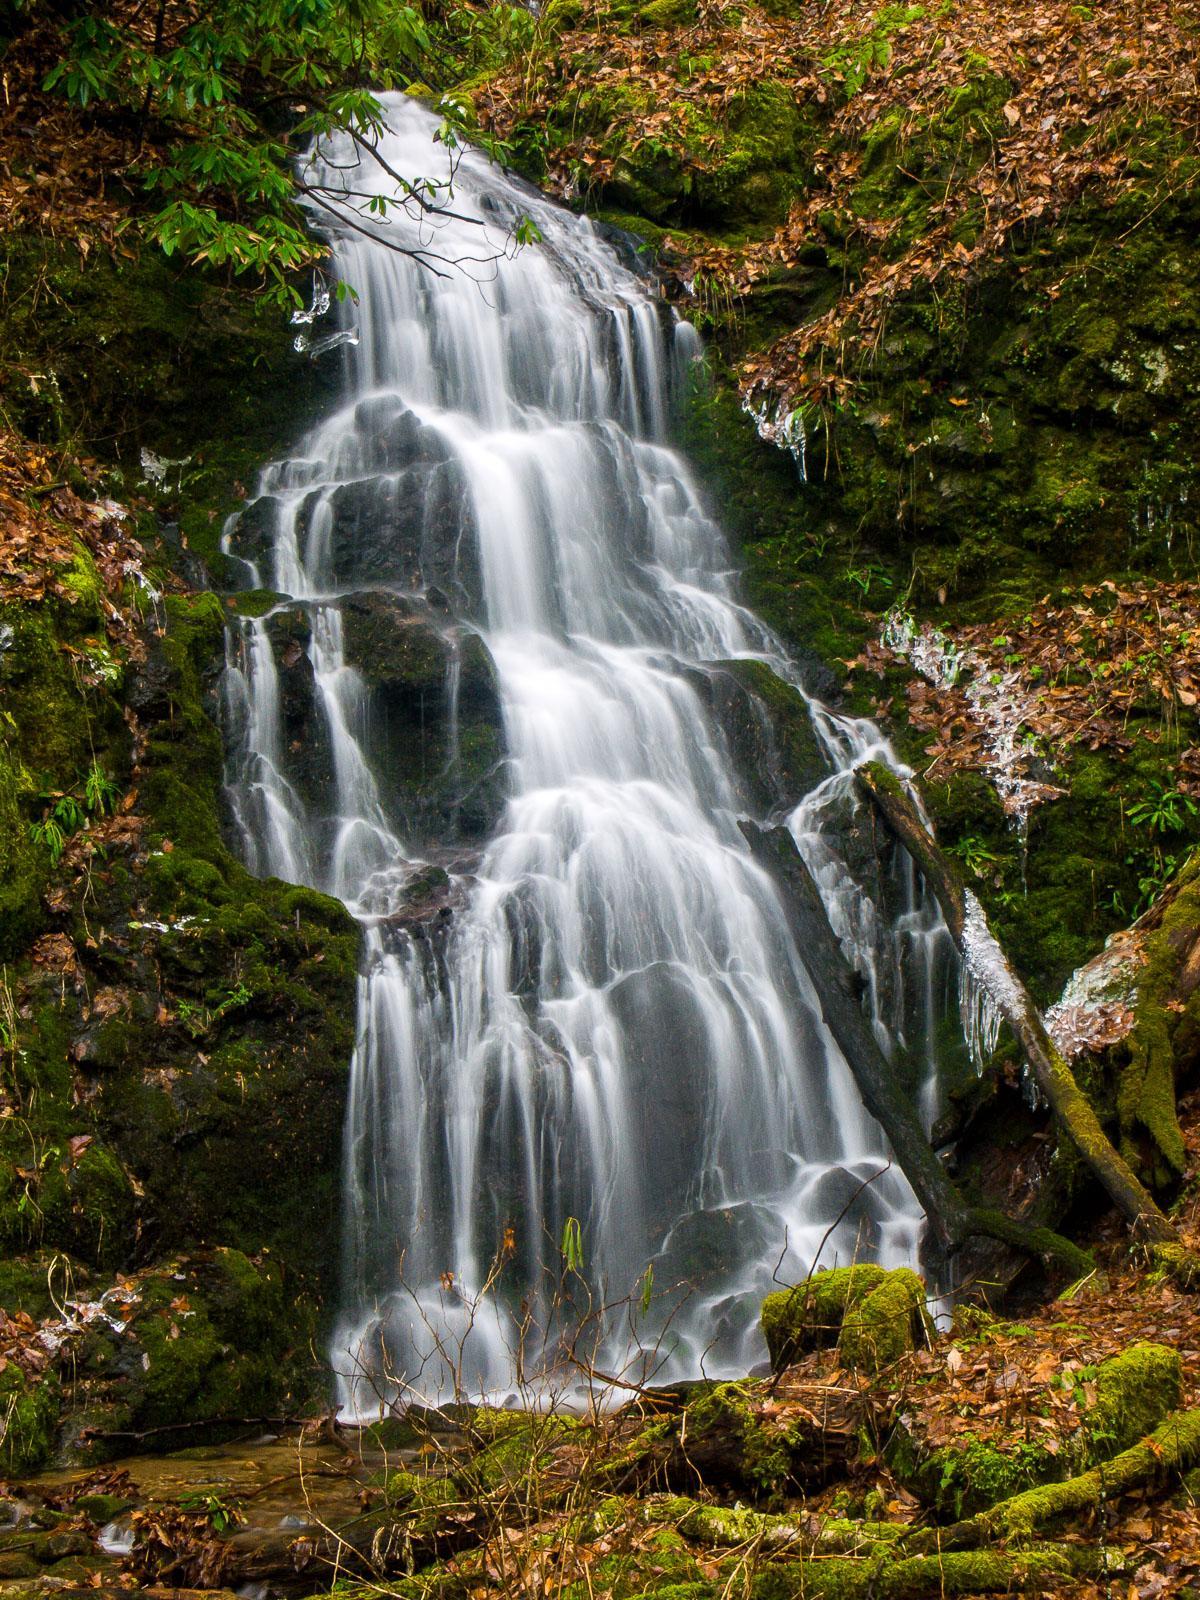 Waterfall below sugarloaf mountain wnc waterfalls waterfall below sugarloaf mountain altavistaventures Gallery